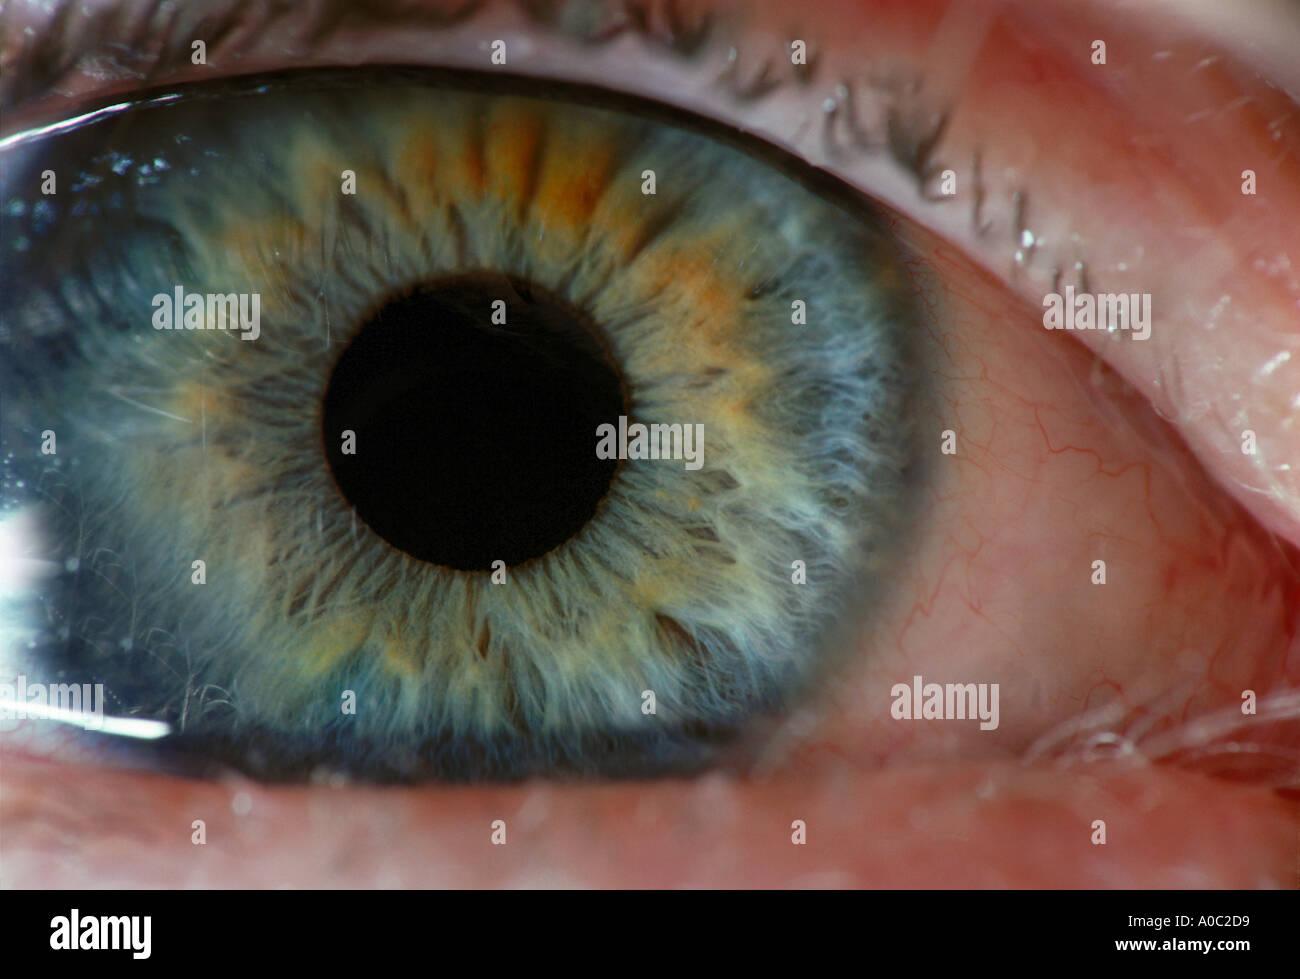 Ojos Ojos azules de la conjuntiva palpebral Pupila Iris pestañas ...